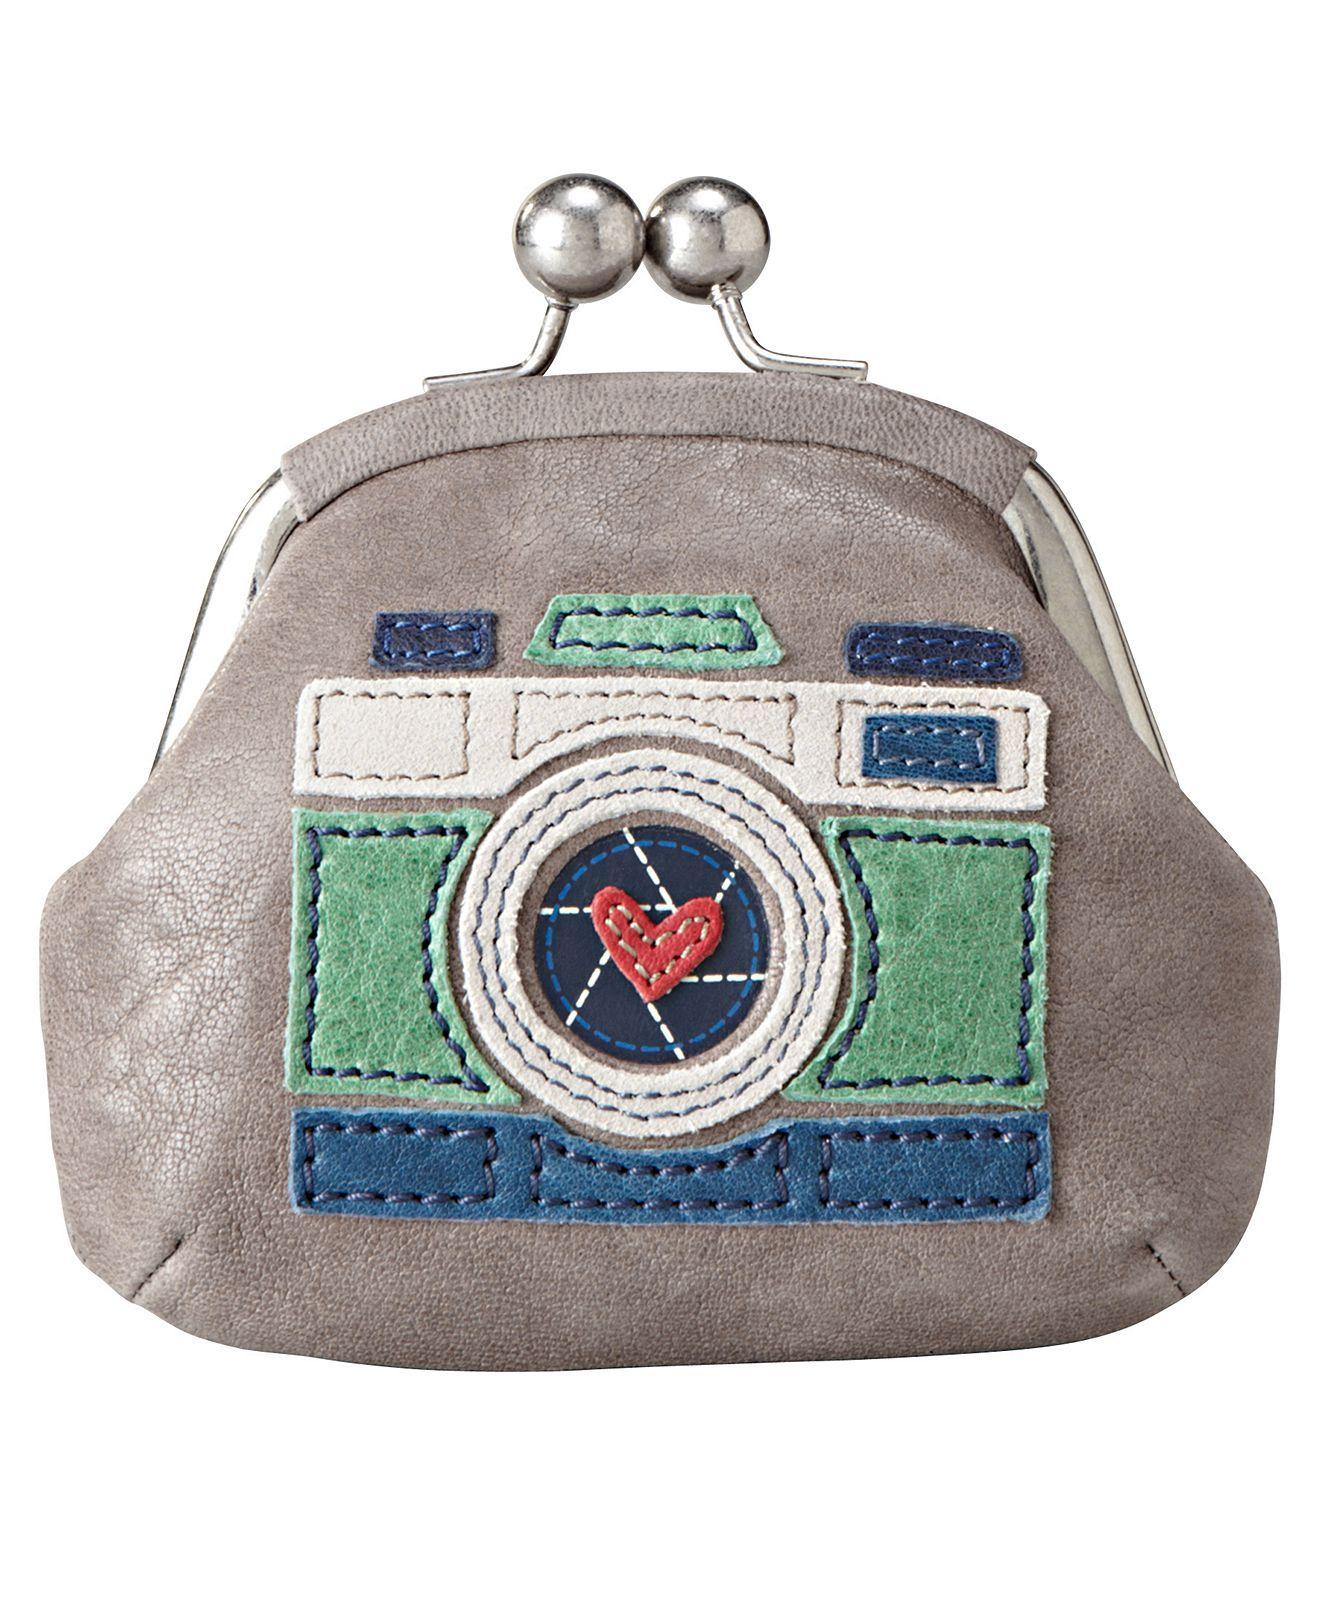 Fossil Handbag Ruby Frame Coin Purse Style And Glam Pinterest Keyper Cross Body Calypso